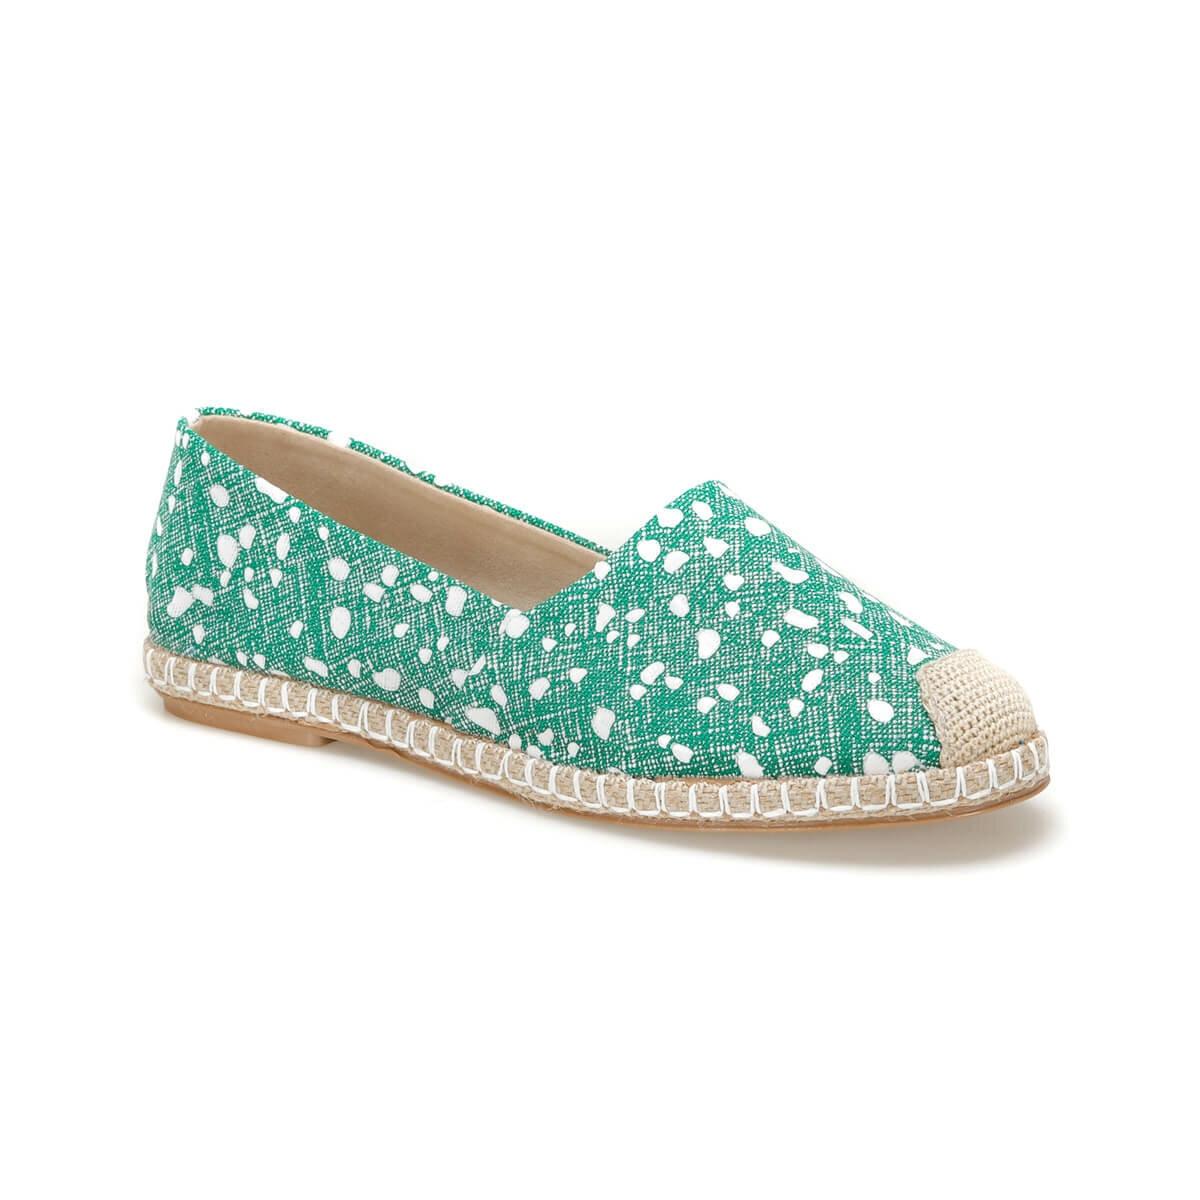 FLO MIROS59Z Green Women Espadril Shoes BUTIGO